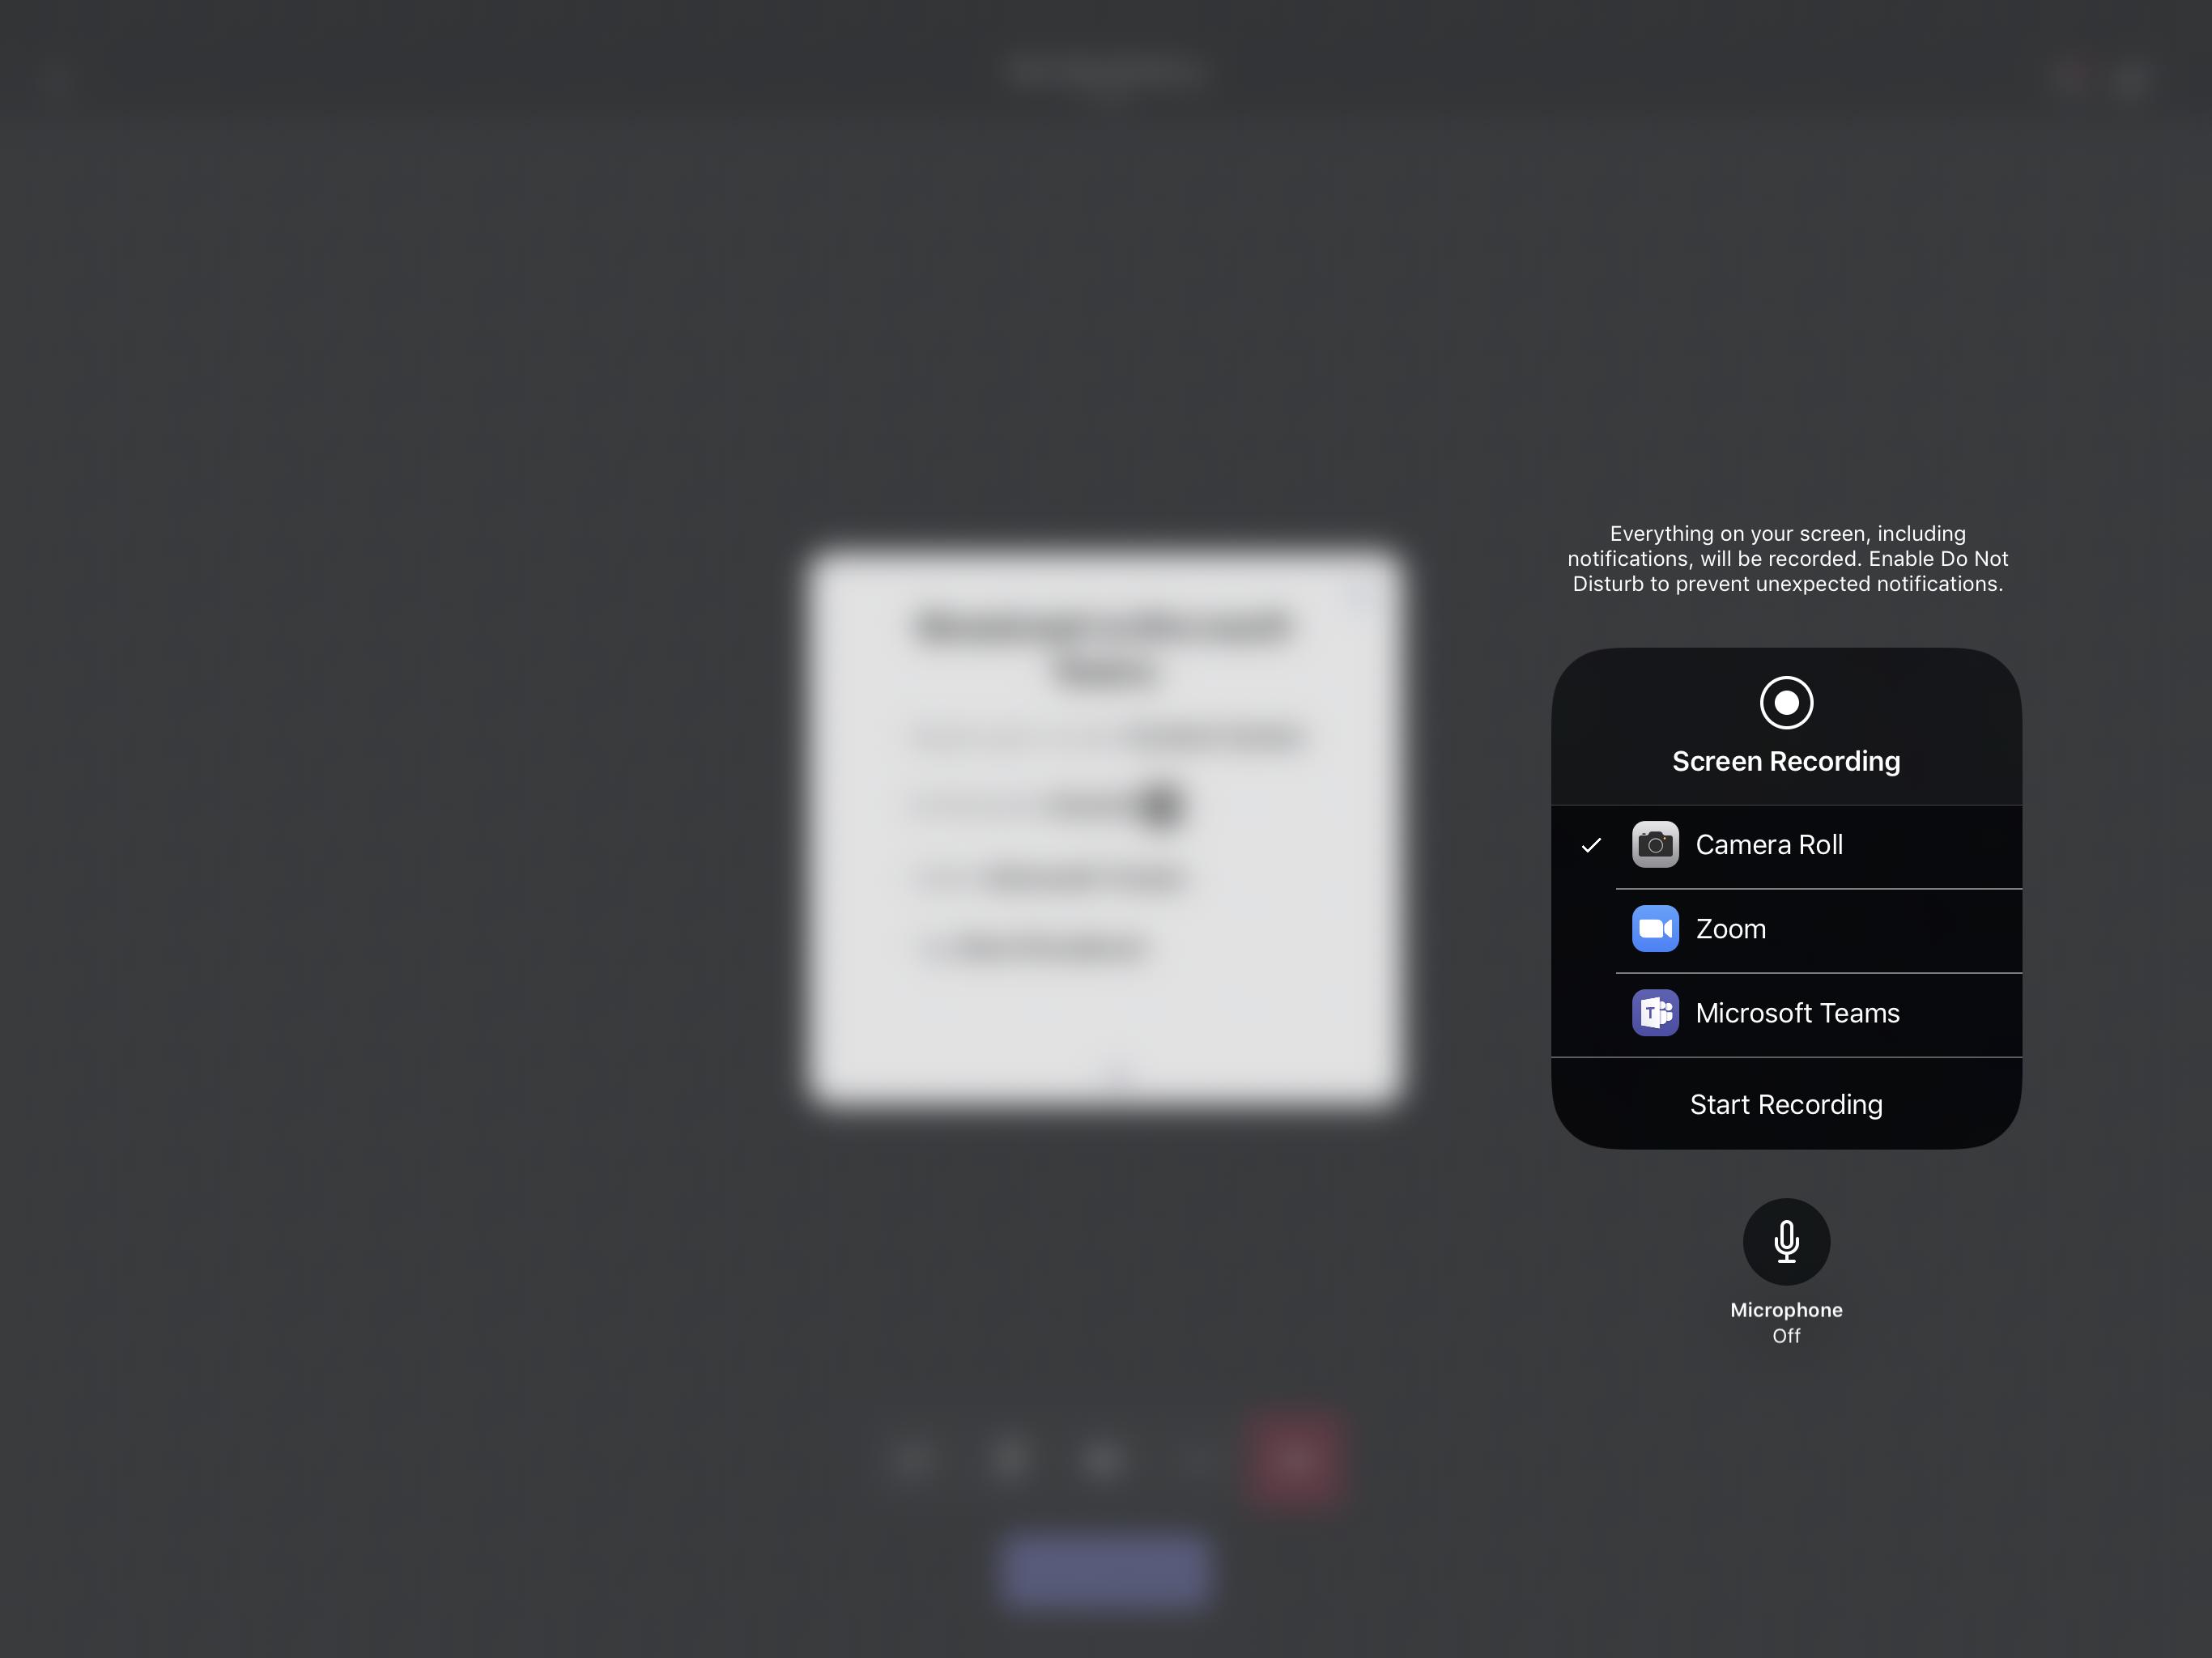 iOS Screen Sharing NOT working on iPad Pro 12 9